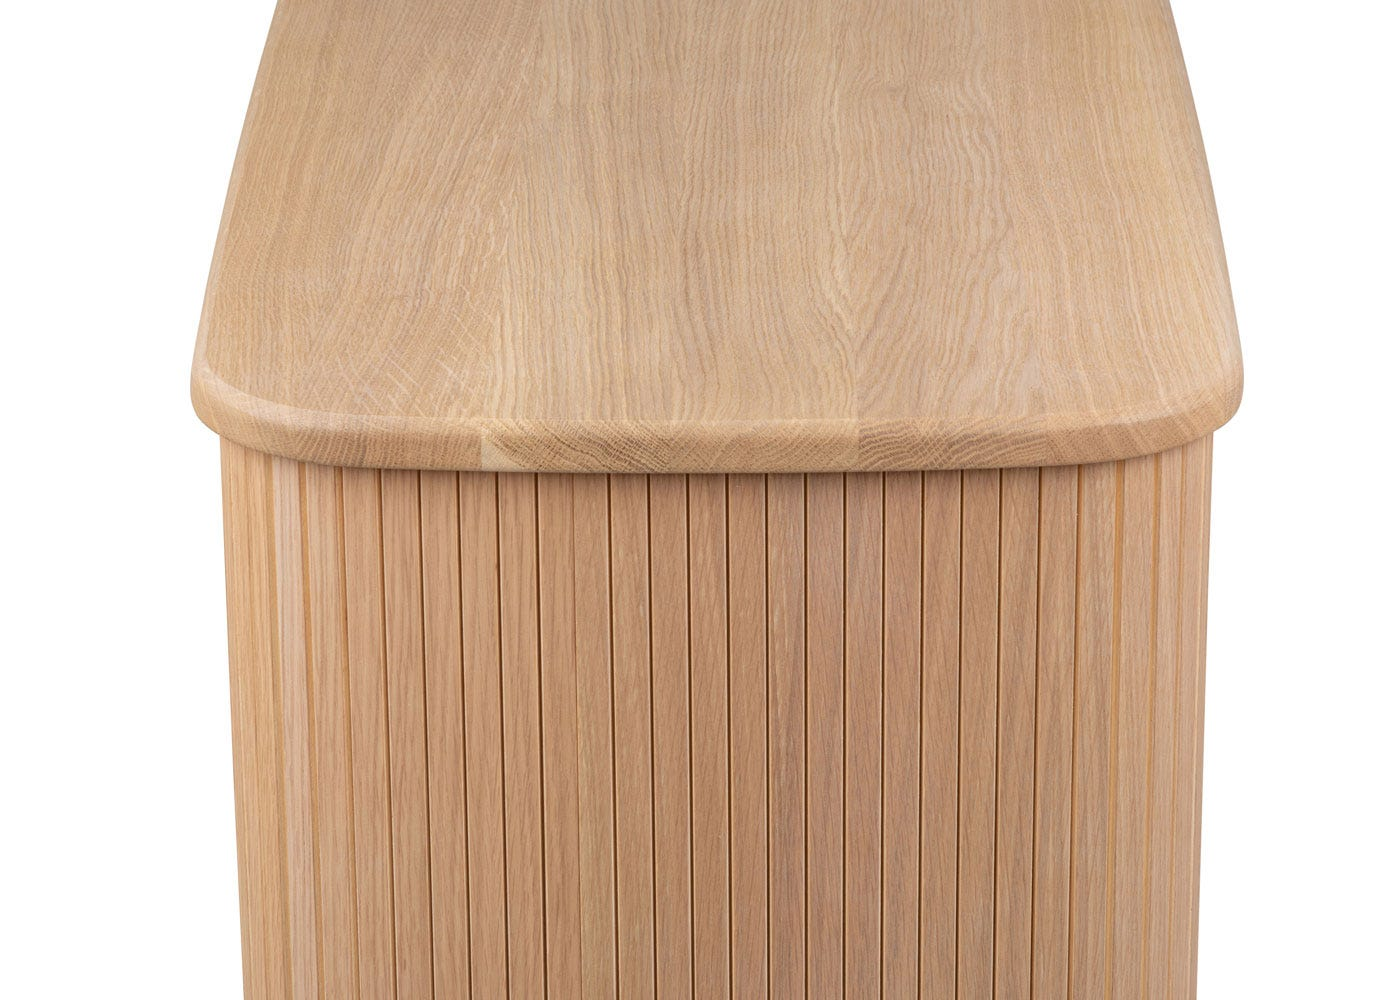 As shown: Solid oak top.